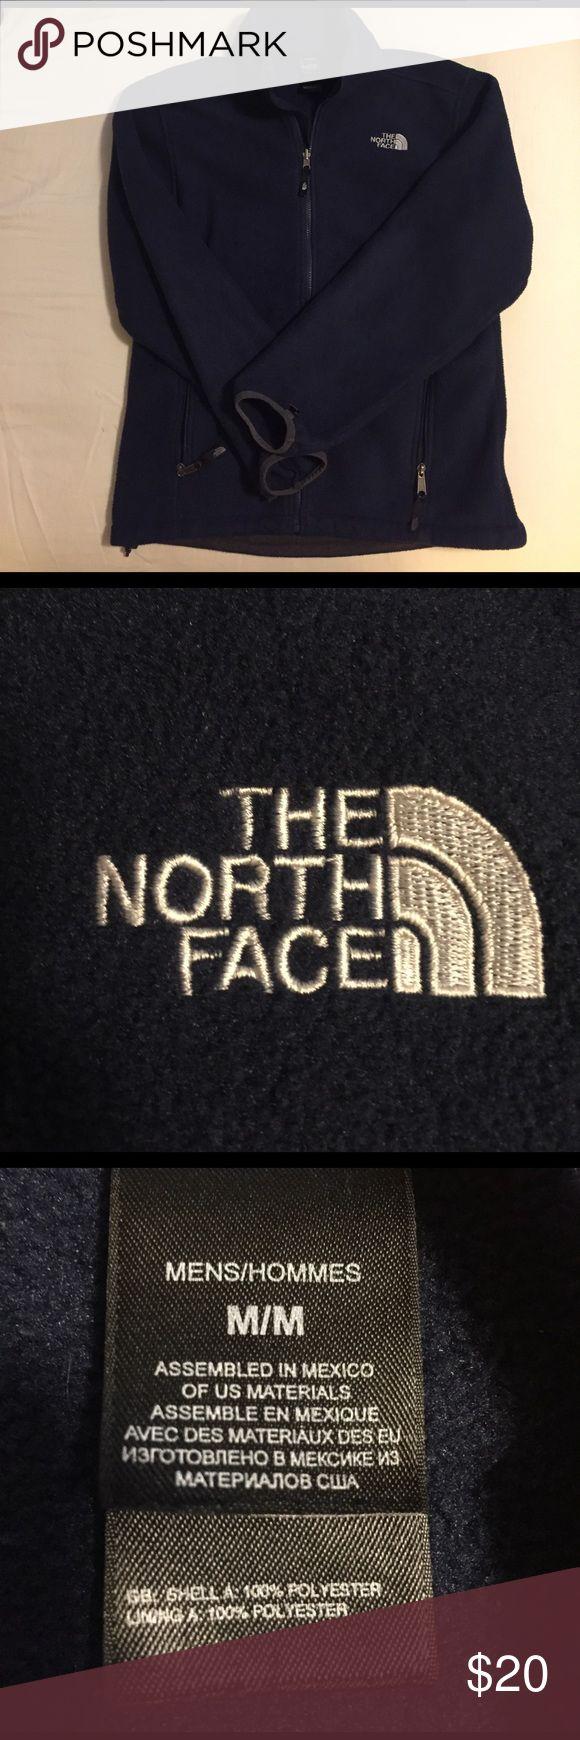 Men's North Face Full-Zip Fleece Jacket Navy Blue Men's North Face Full Zip Jacket. Size Men's Medium The North Face Jackets & Coats Lightweight & Shirt Jackets